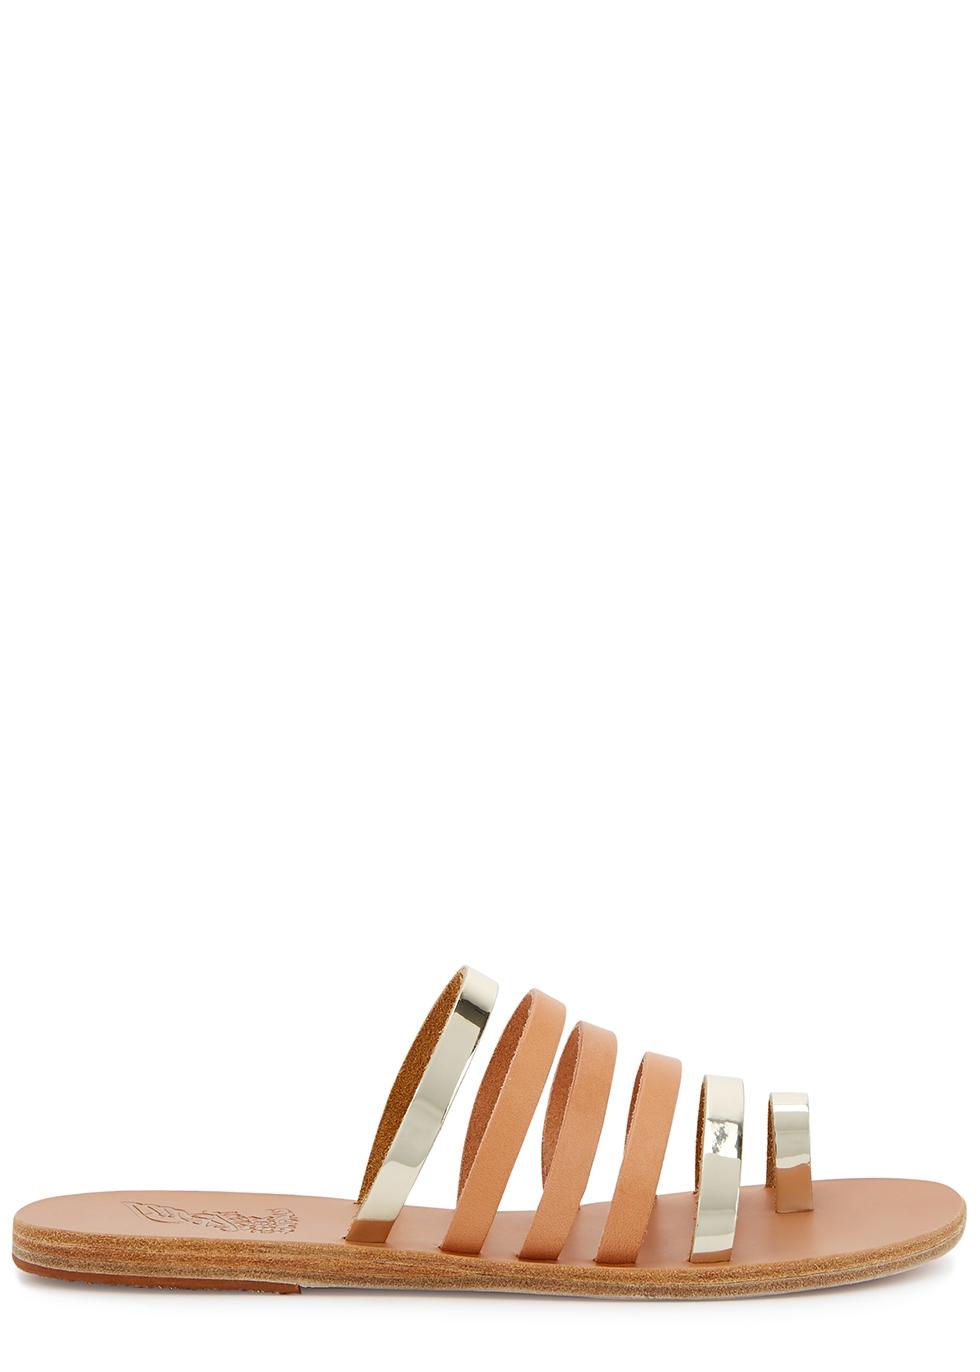 Niki blush leather sandals